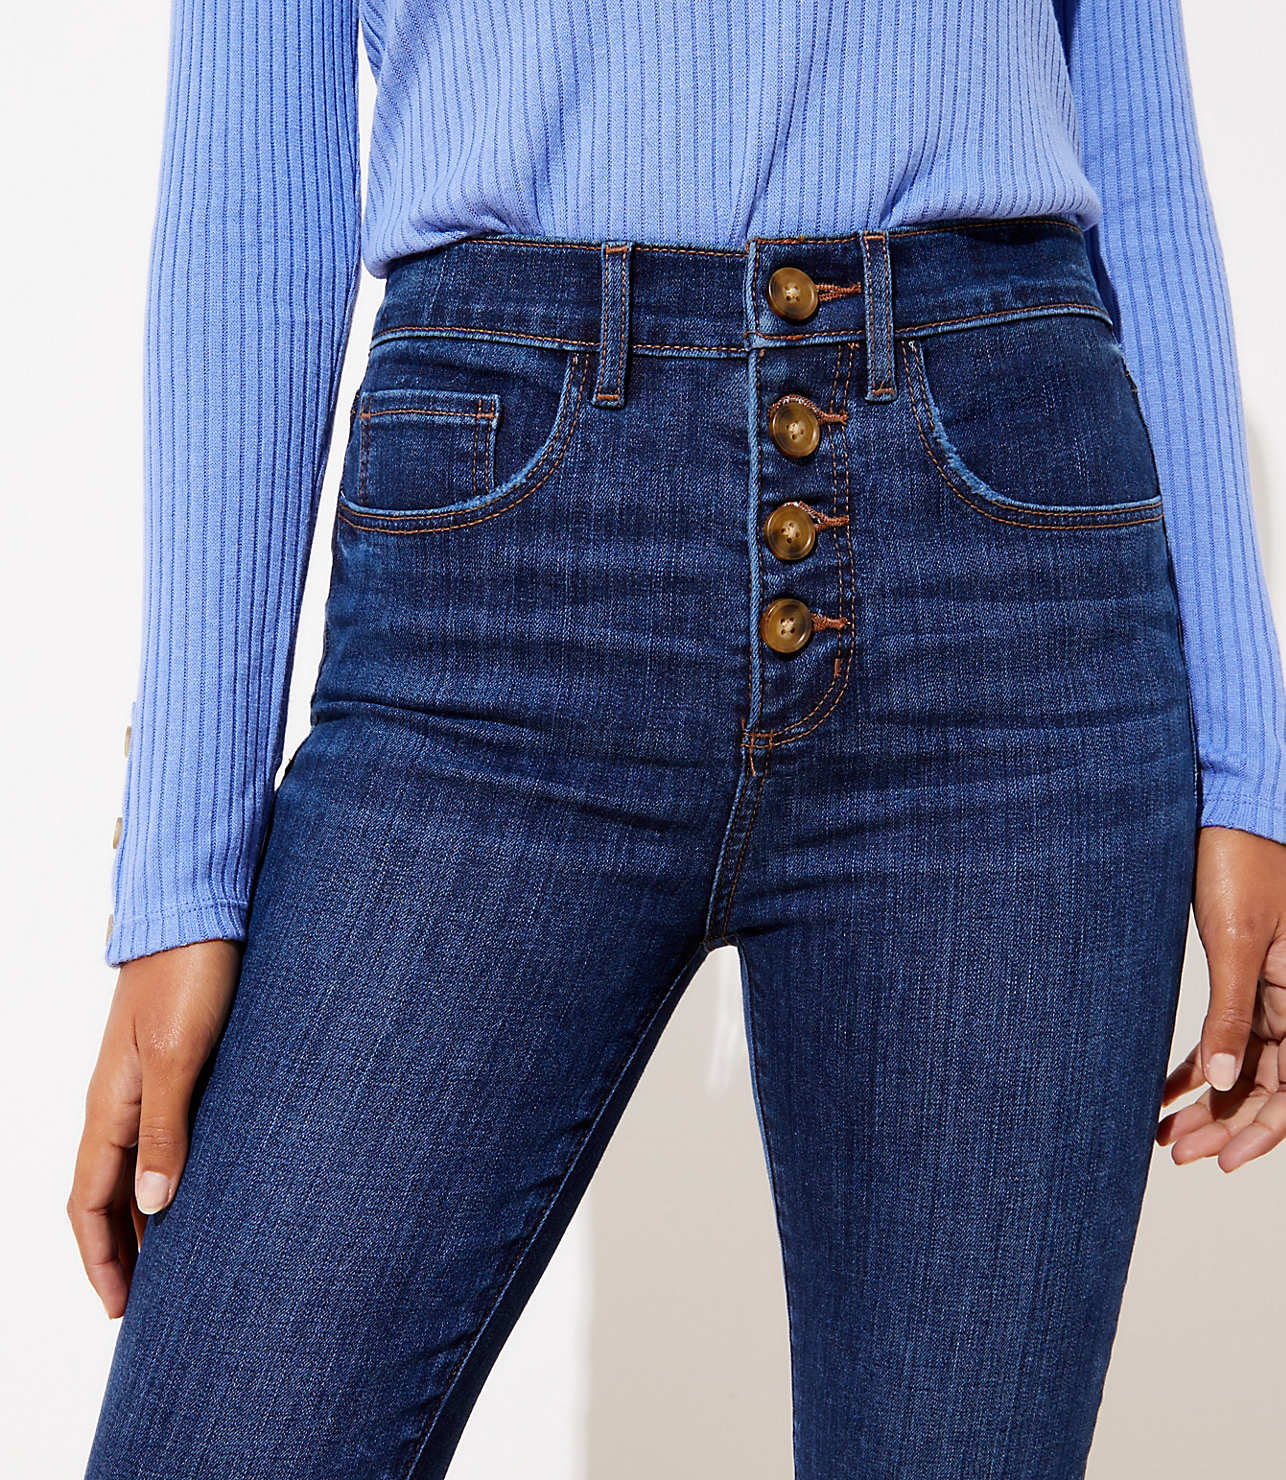 info for 9247f 427a3 Curvy High Rise Slim Pocket Skinny Jeans in Staple Dark Indigo Wash | LOFT